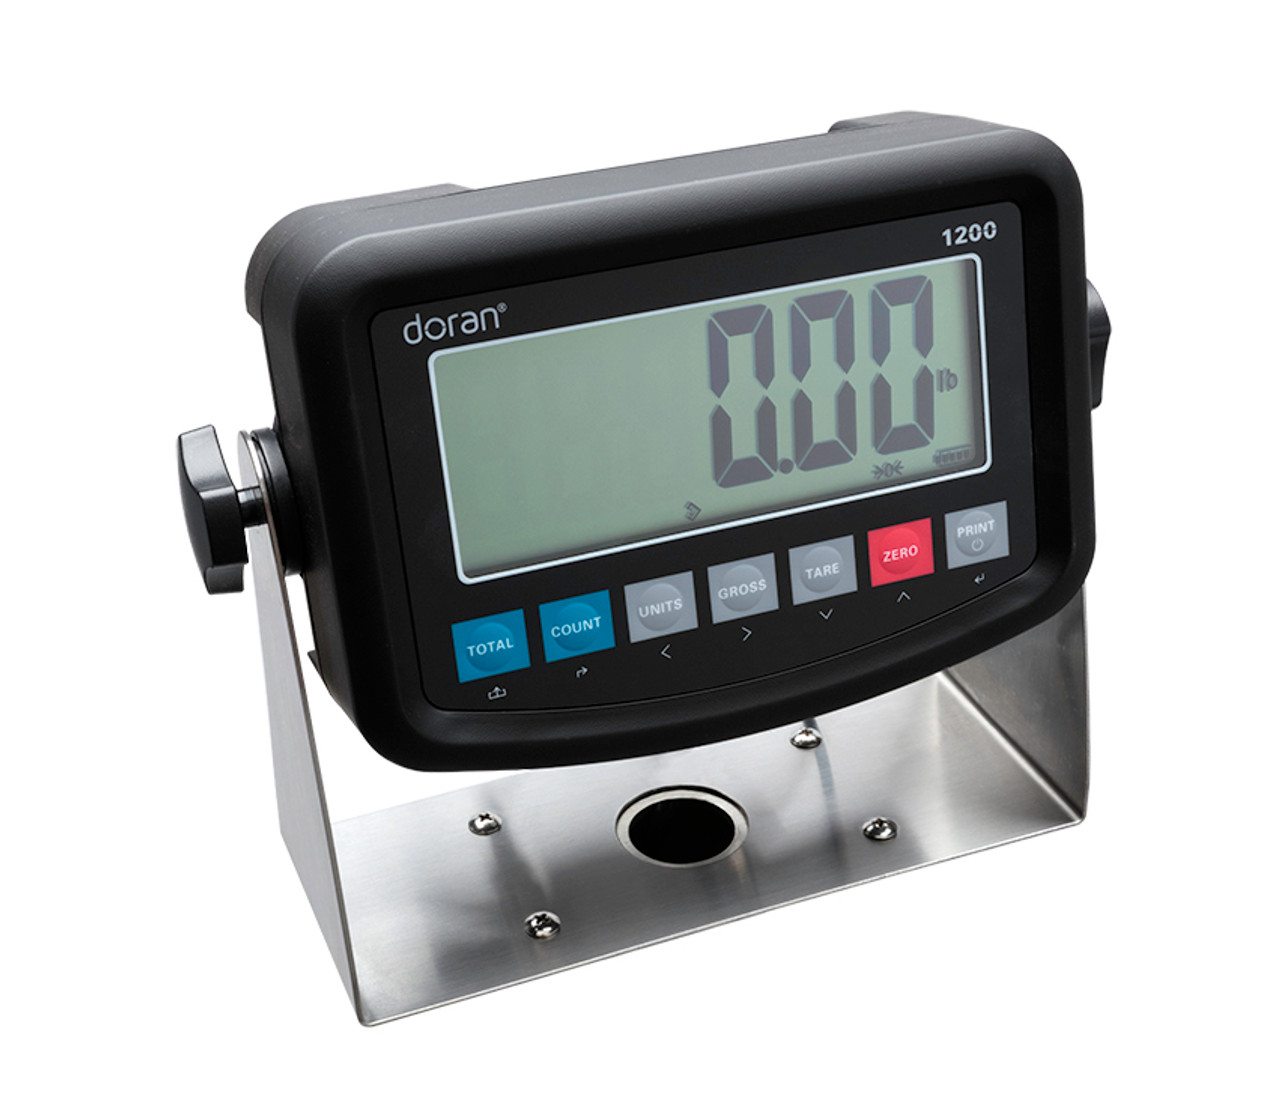 Doran 1200 MSP Bench Scale